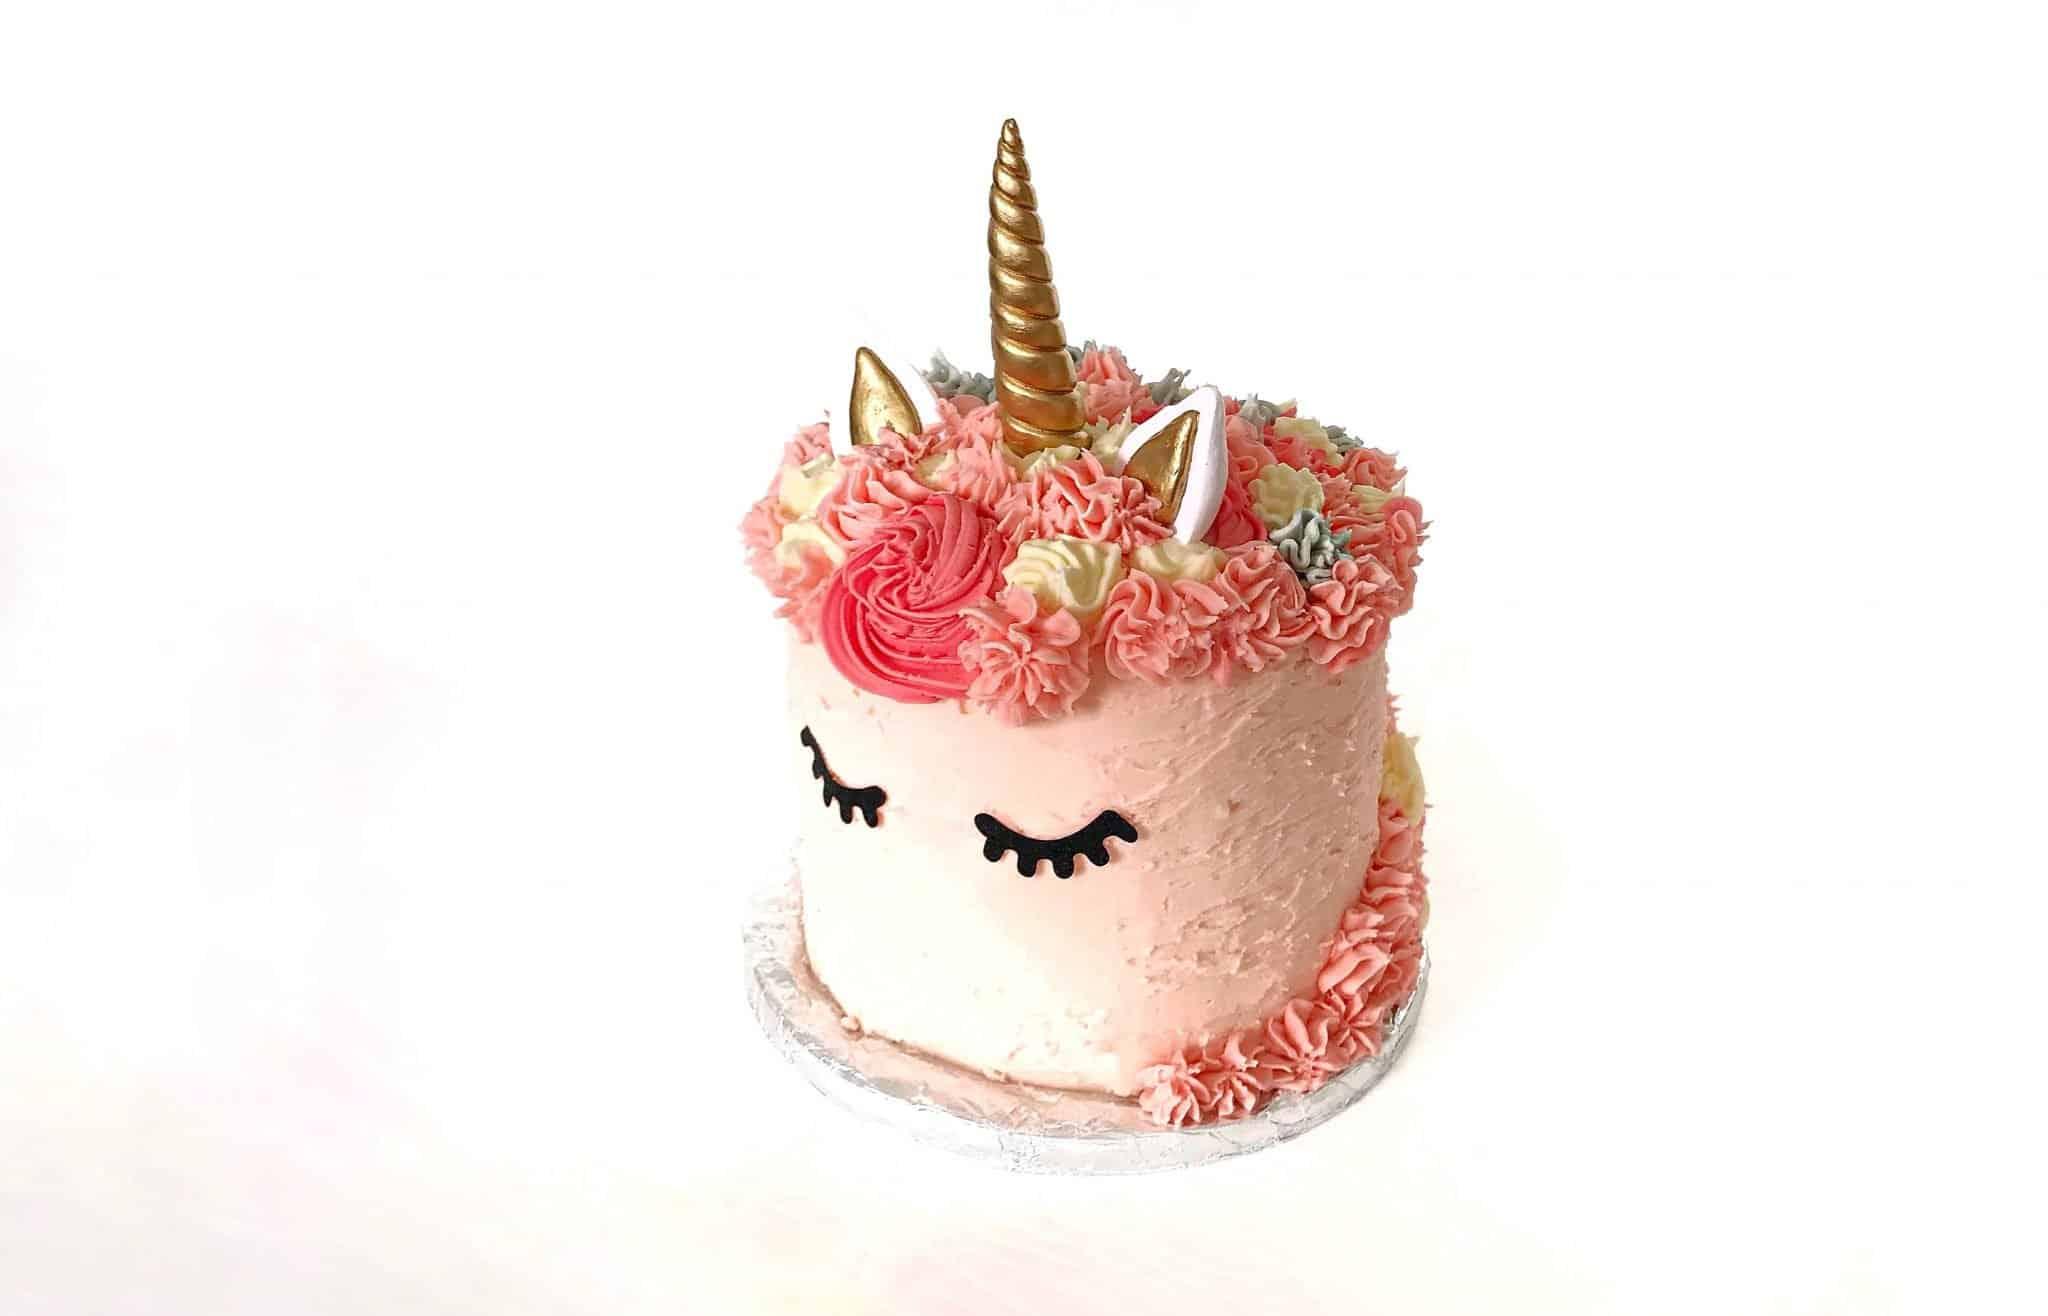 How To Make A Super Cute Rainbow Unicorn Cake Pinkscharming